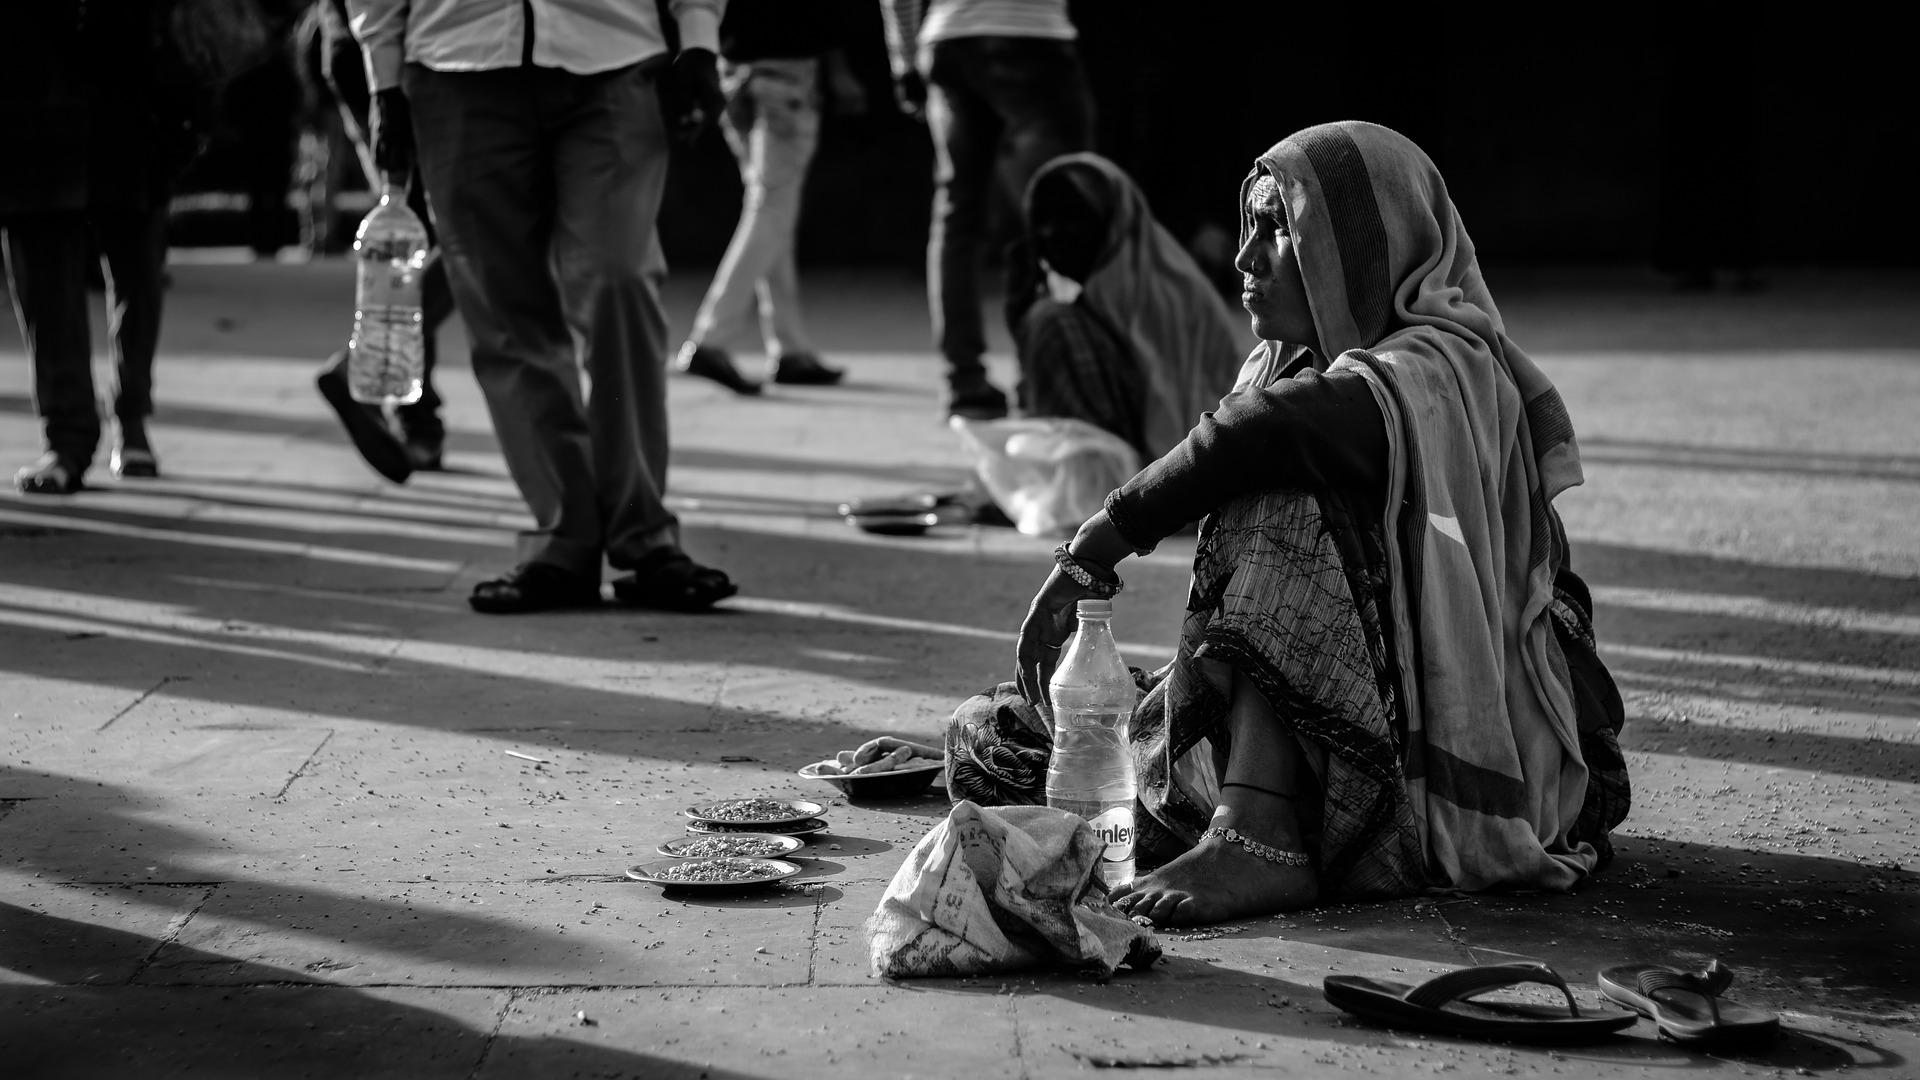 Poverty - pixabay